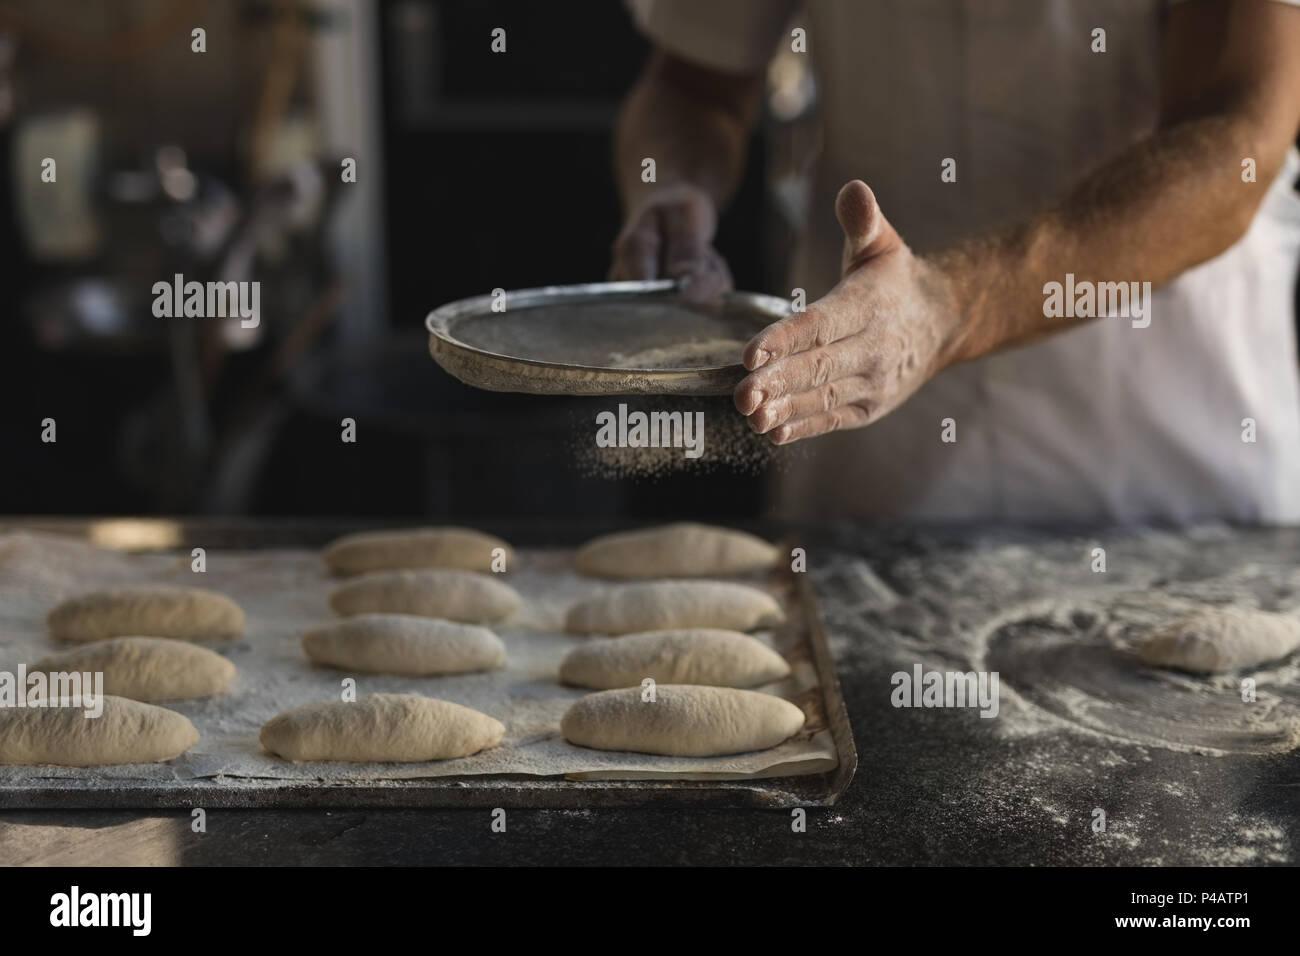 Male baker preparing dough in bakery shop - Stock Image